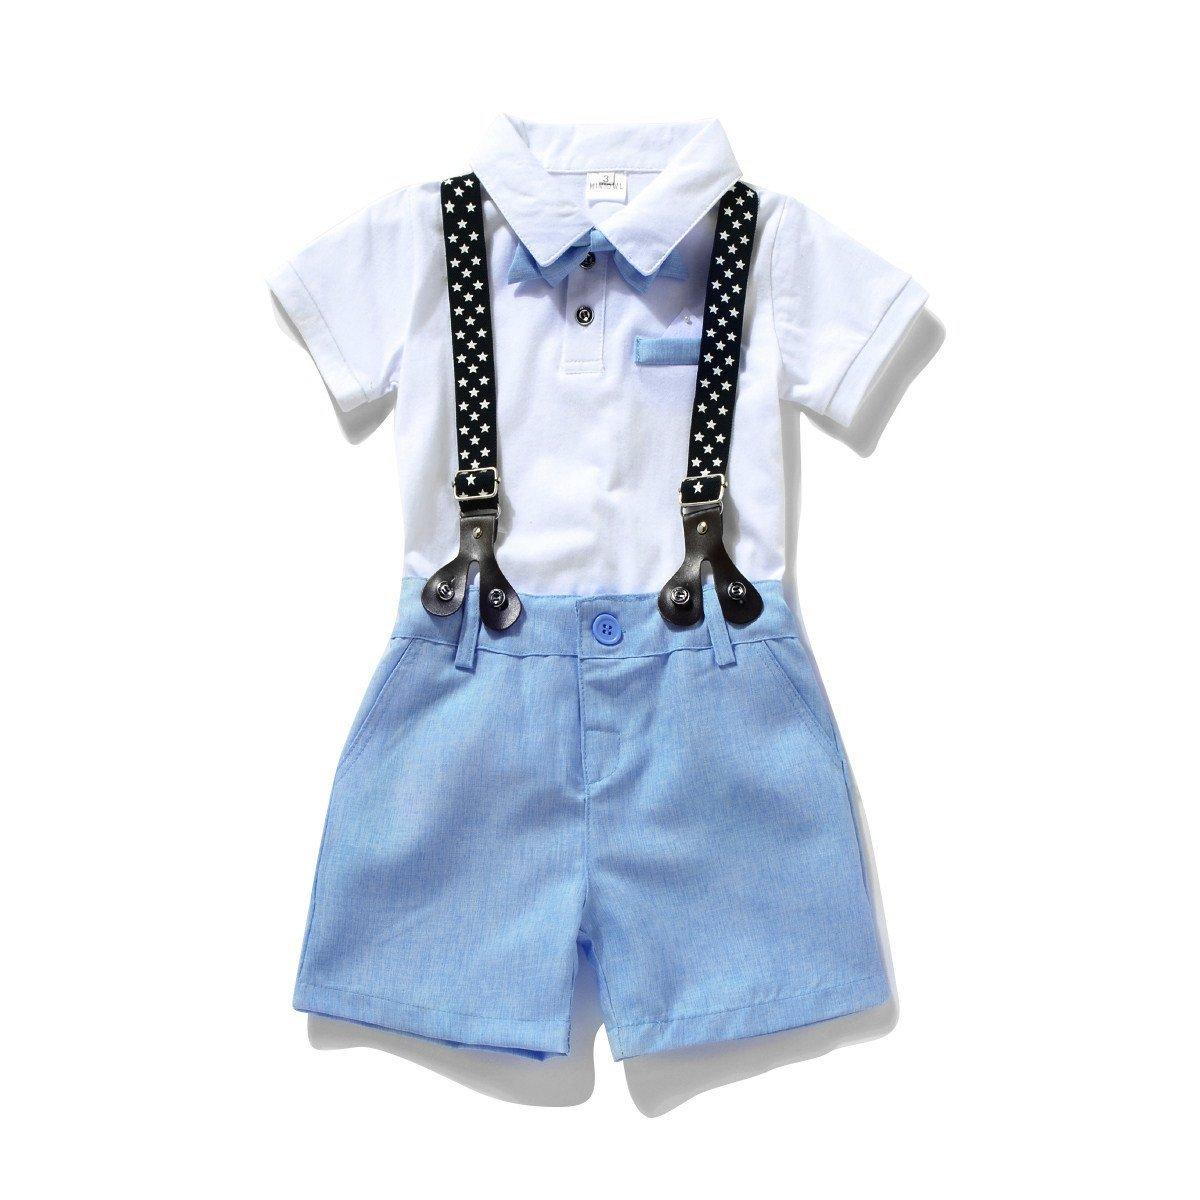 Miniowl ® Toddler Boys 2 PCS Set Gentleman Bowtie Polo T-shirt Bid Shorts Overalls (2t, White)